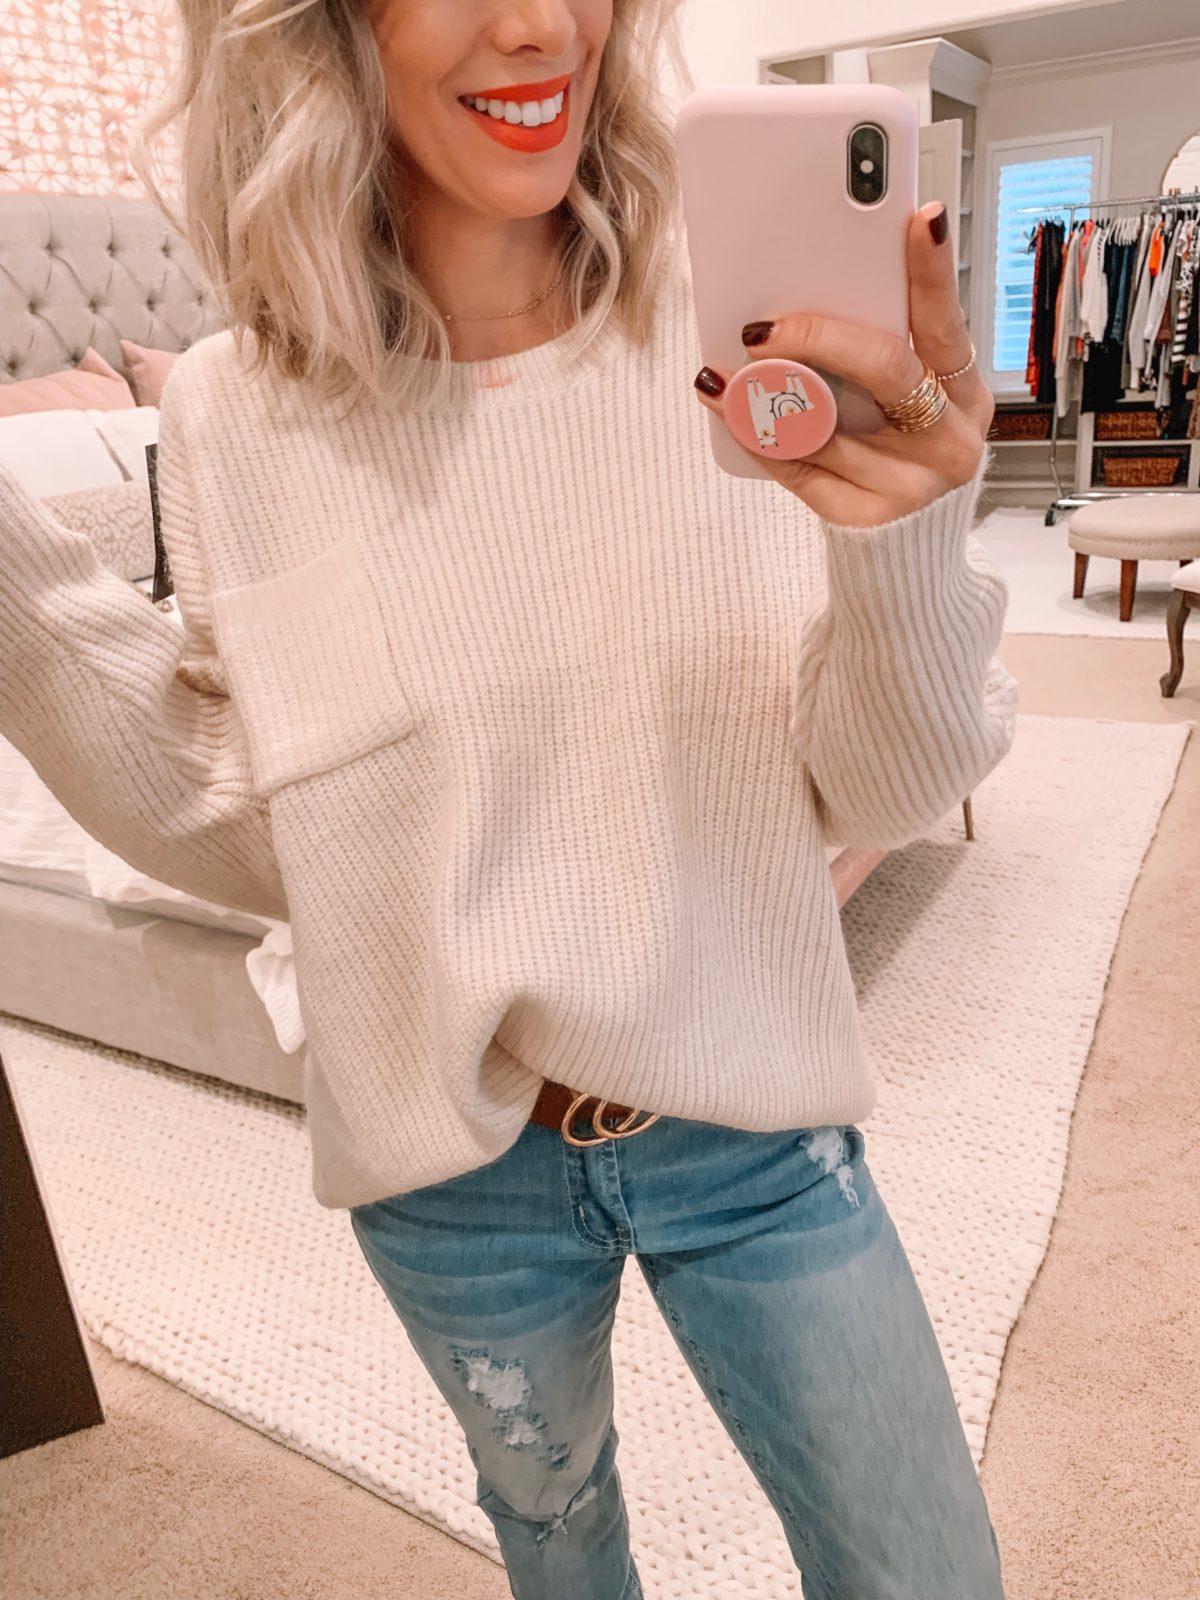 Amazon Prime Fashion-Beige Sweater